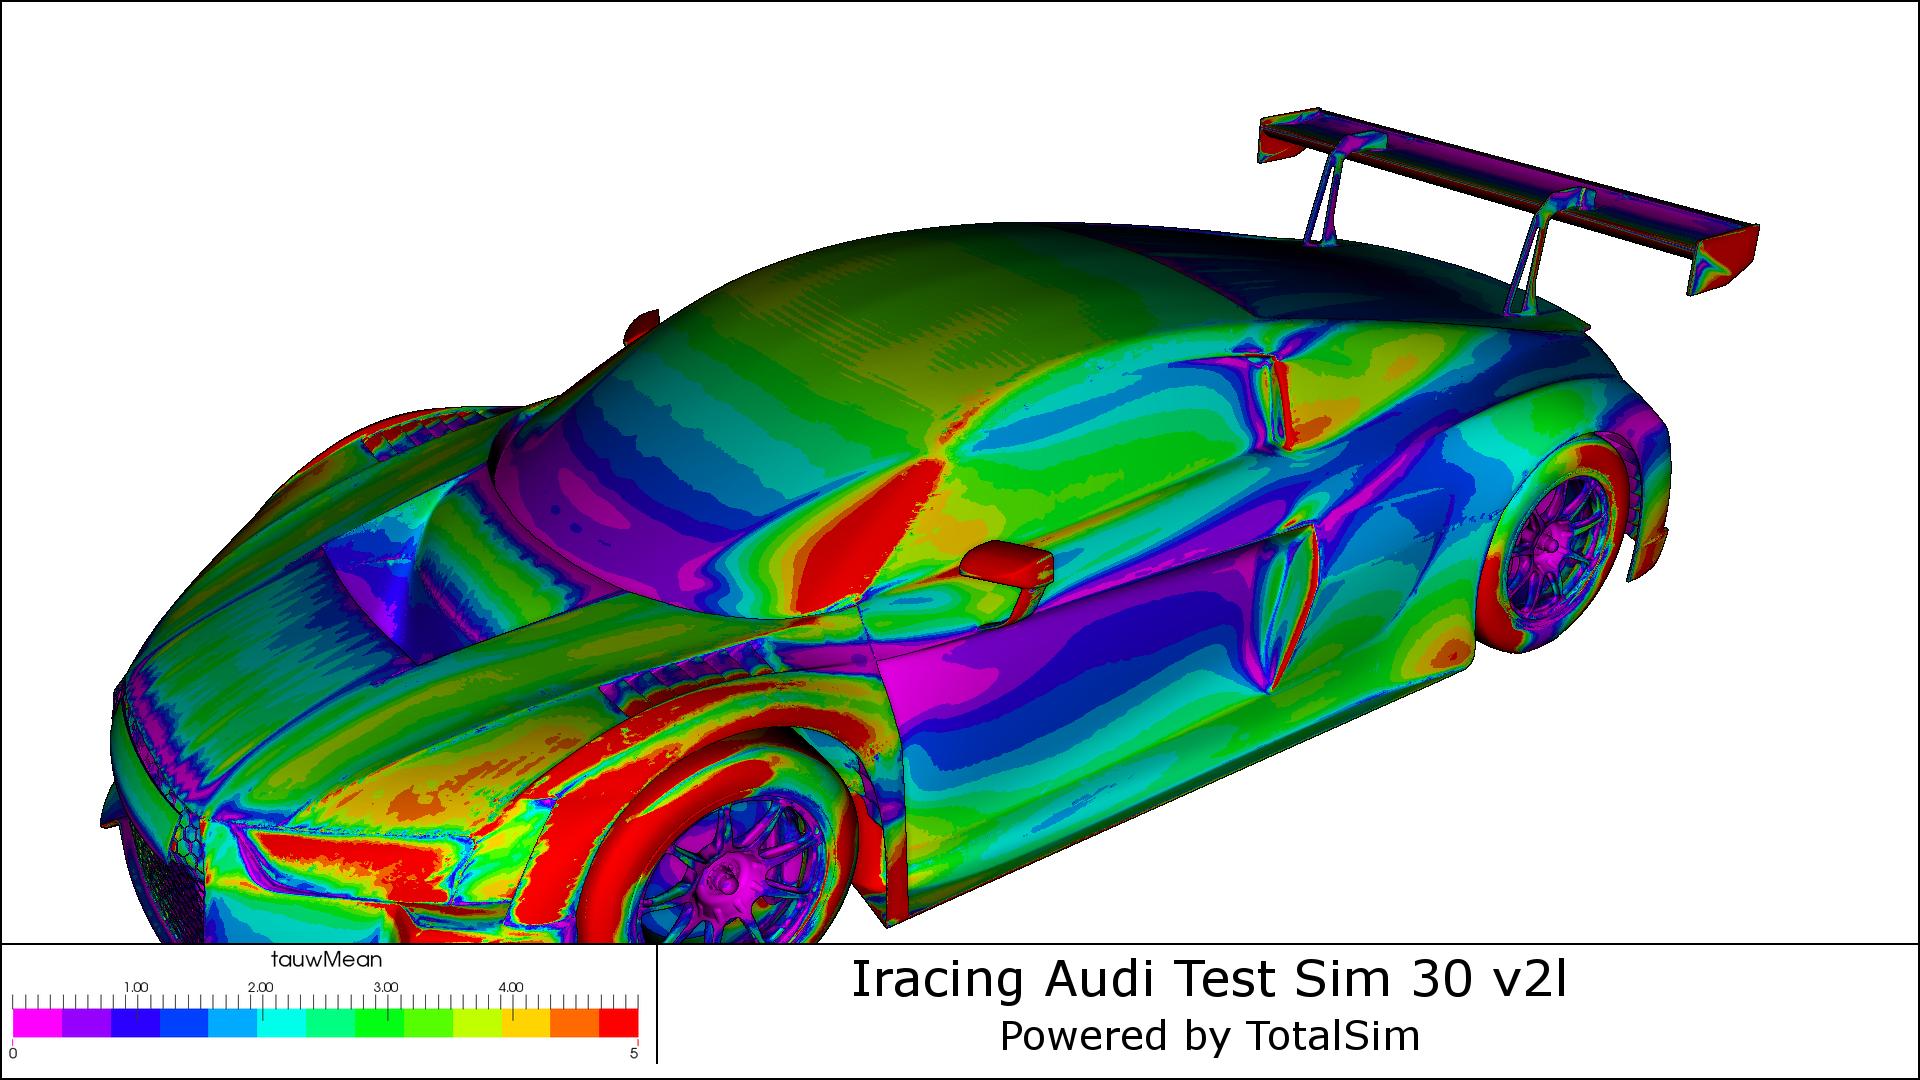 iRacing's Ongoing Pursuit of Race Simulation Realism - iRacing com